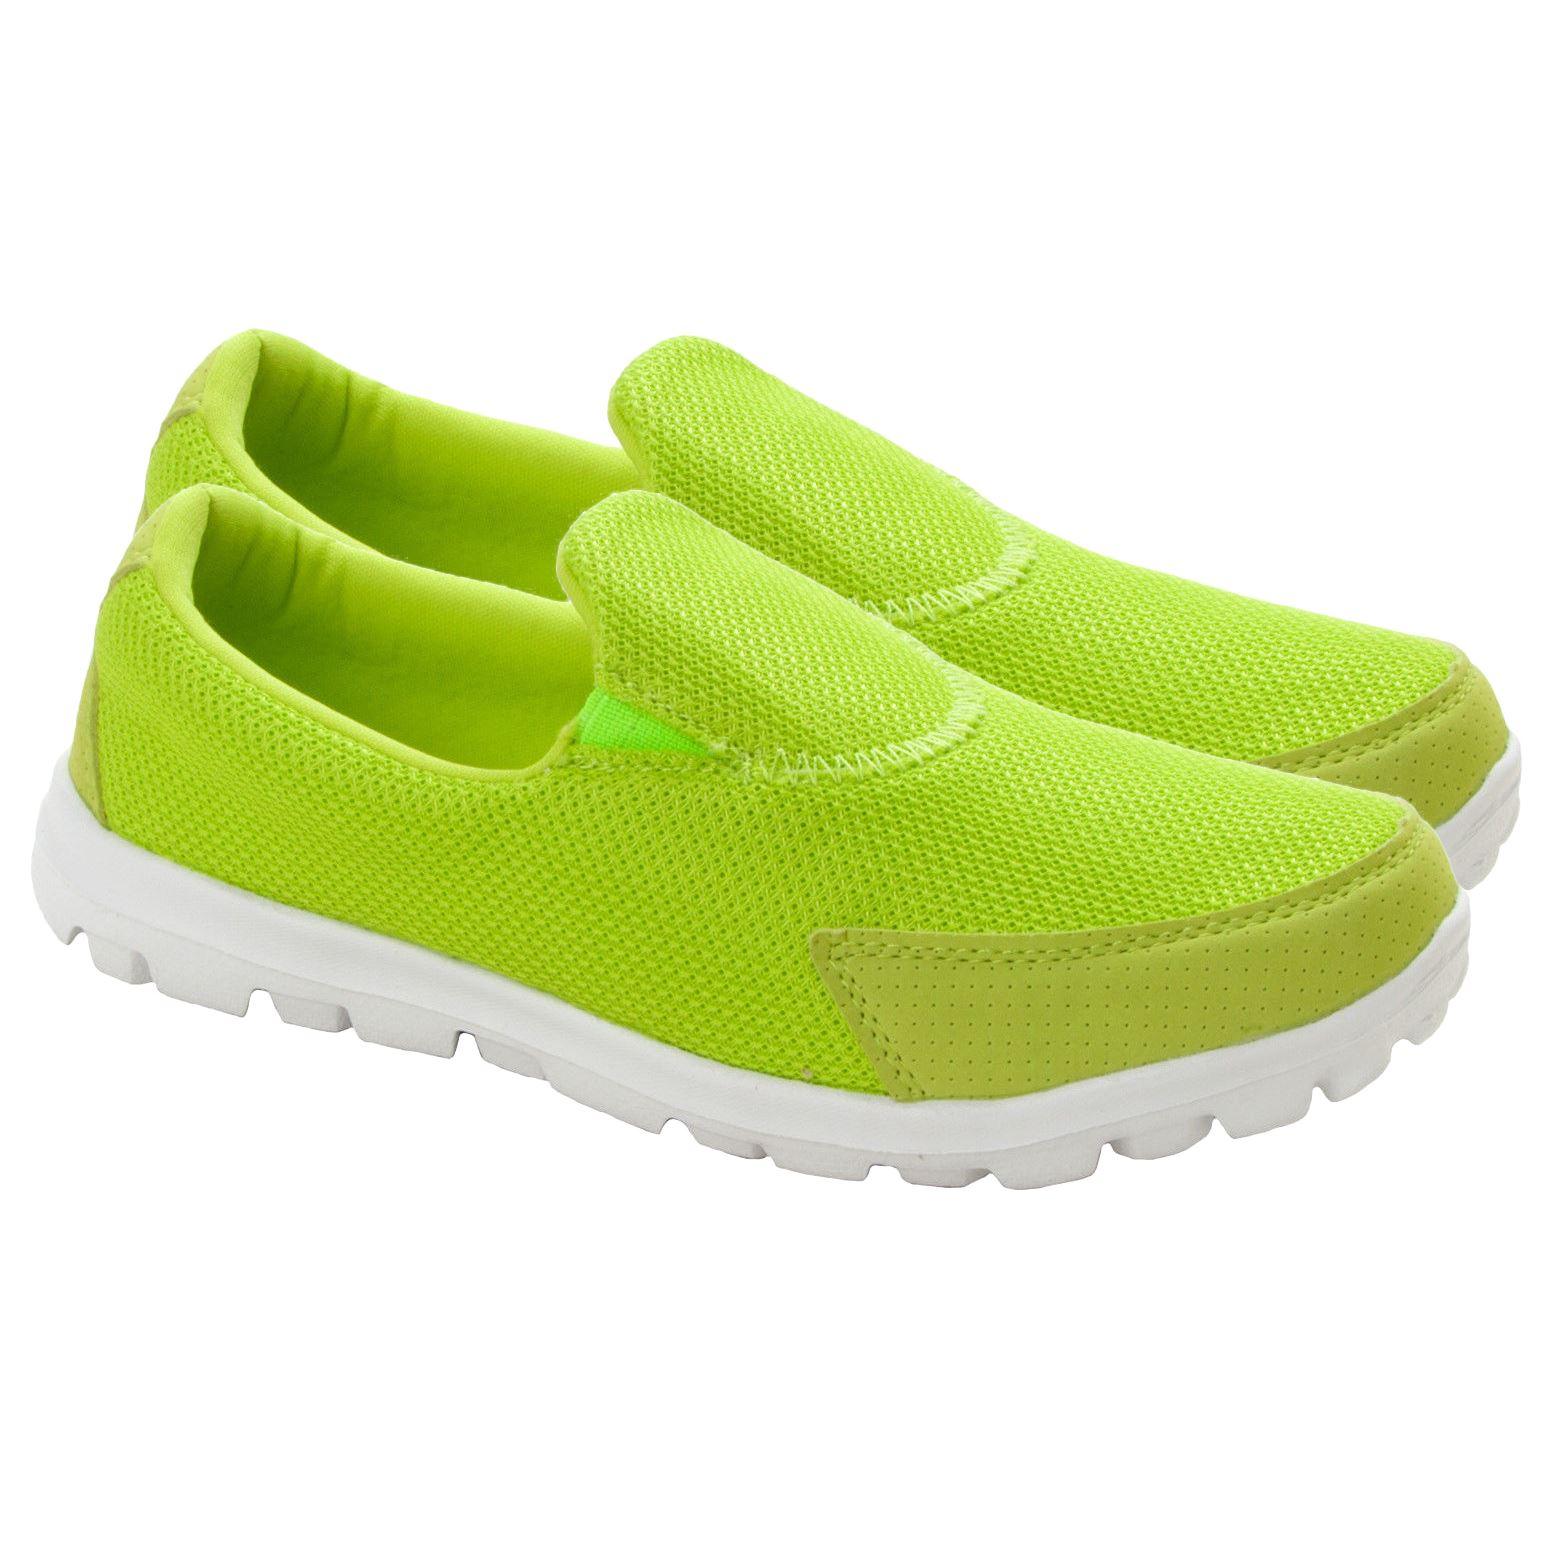 Trainers Pumps Ladies Flat Shoes Size